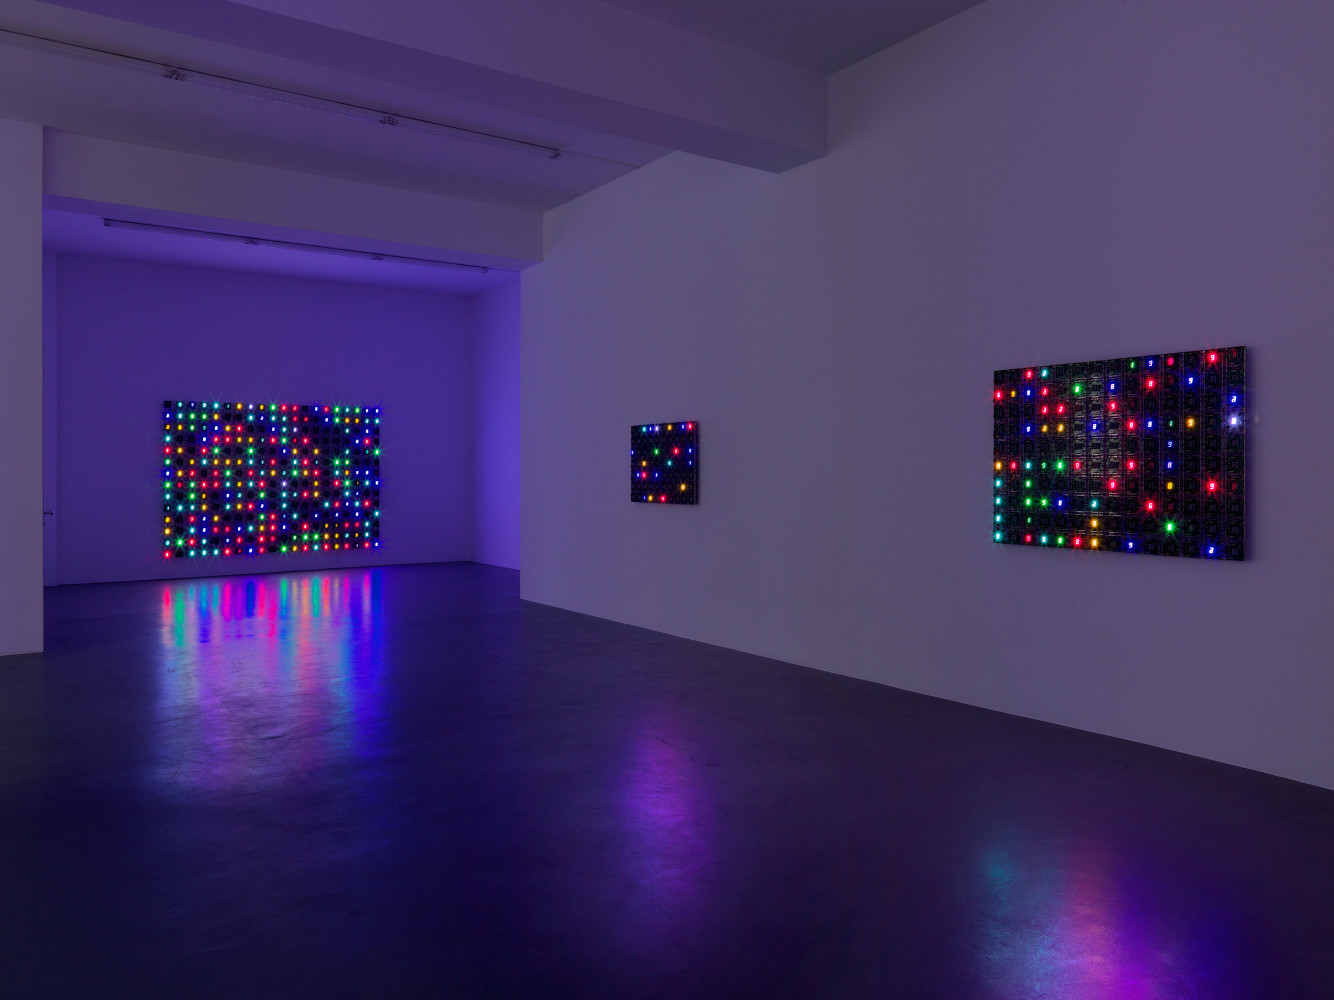 Tatsuo Miyajima, Installation view, Buchmann Galerie, 2013